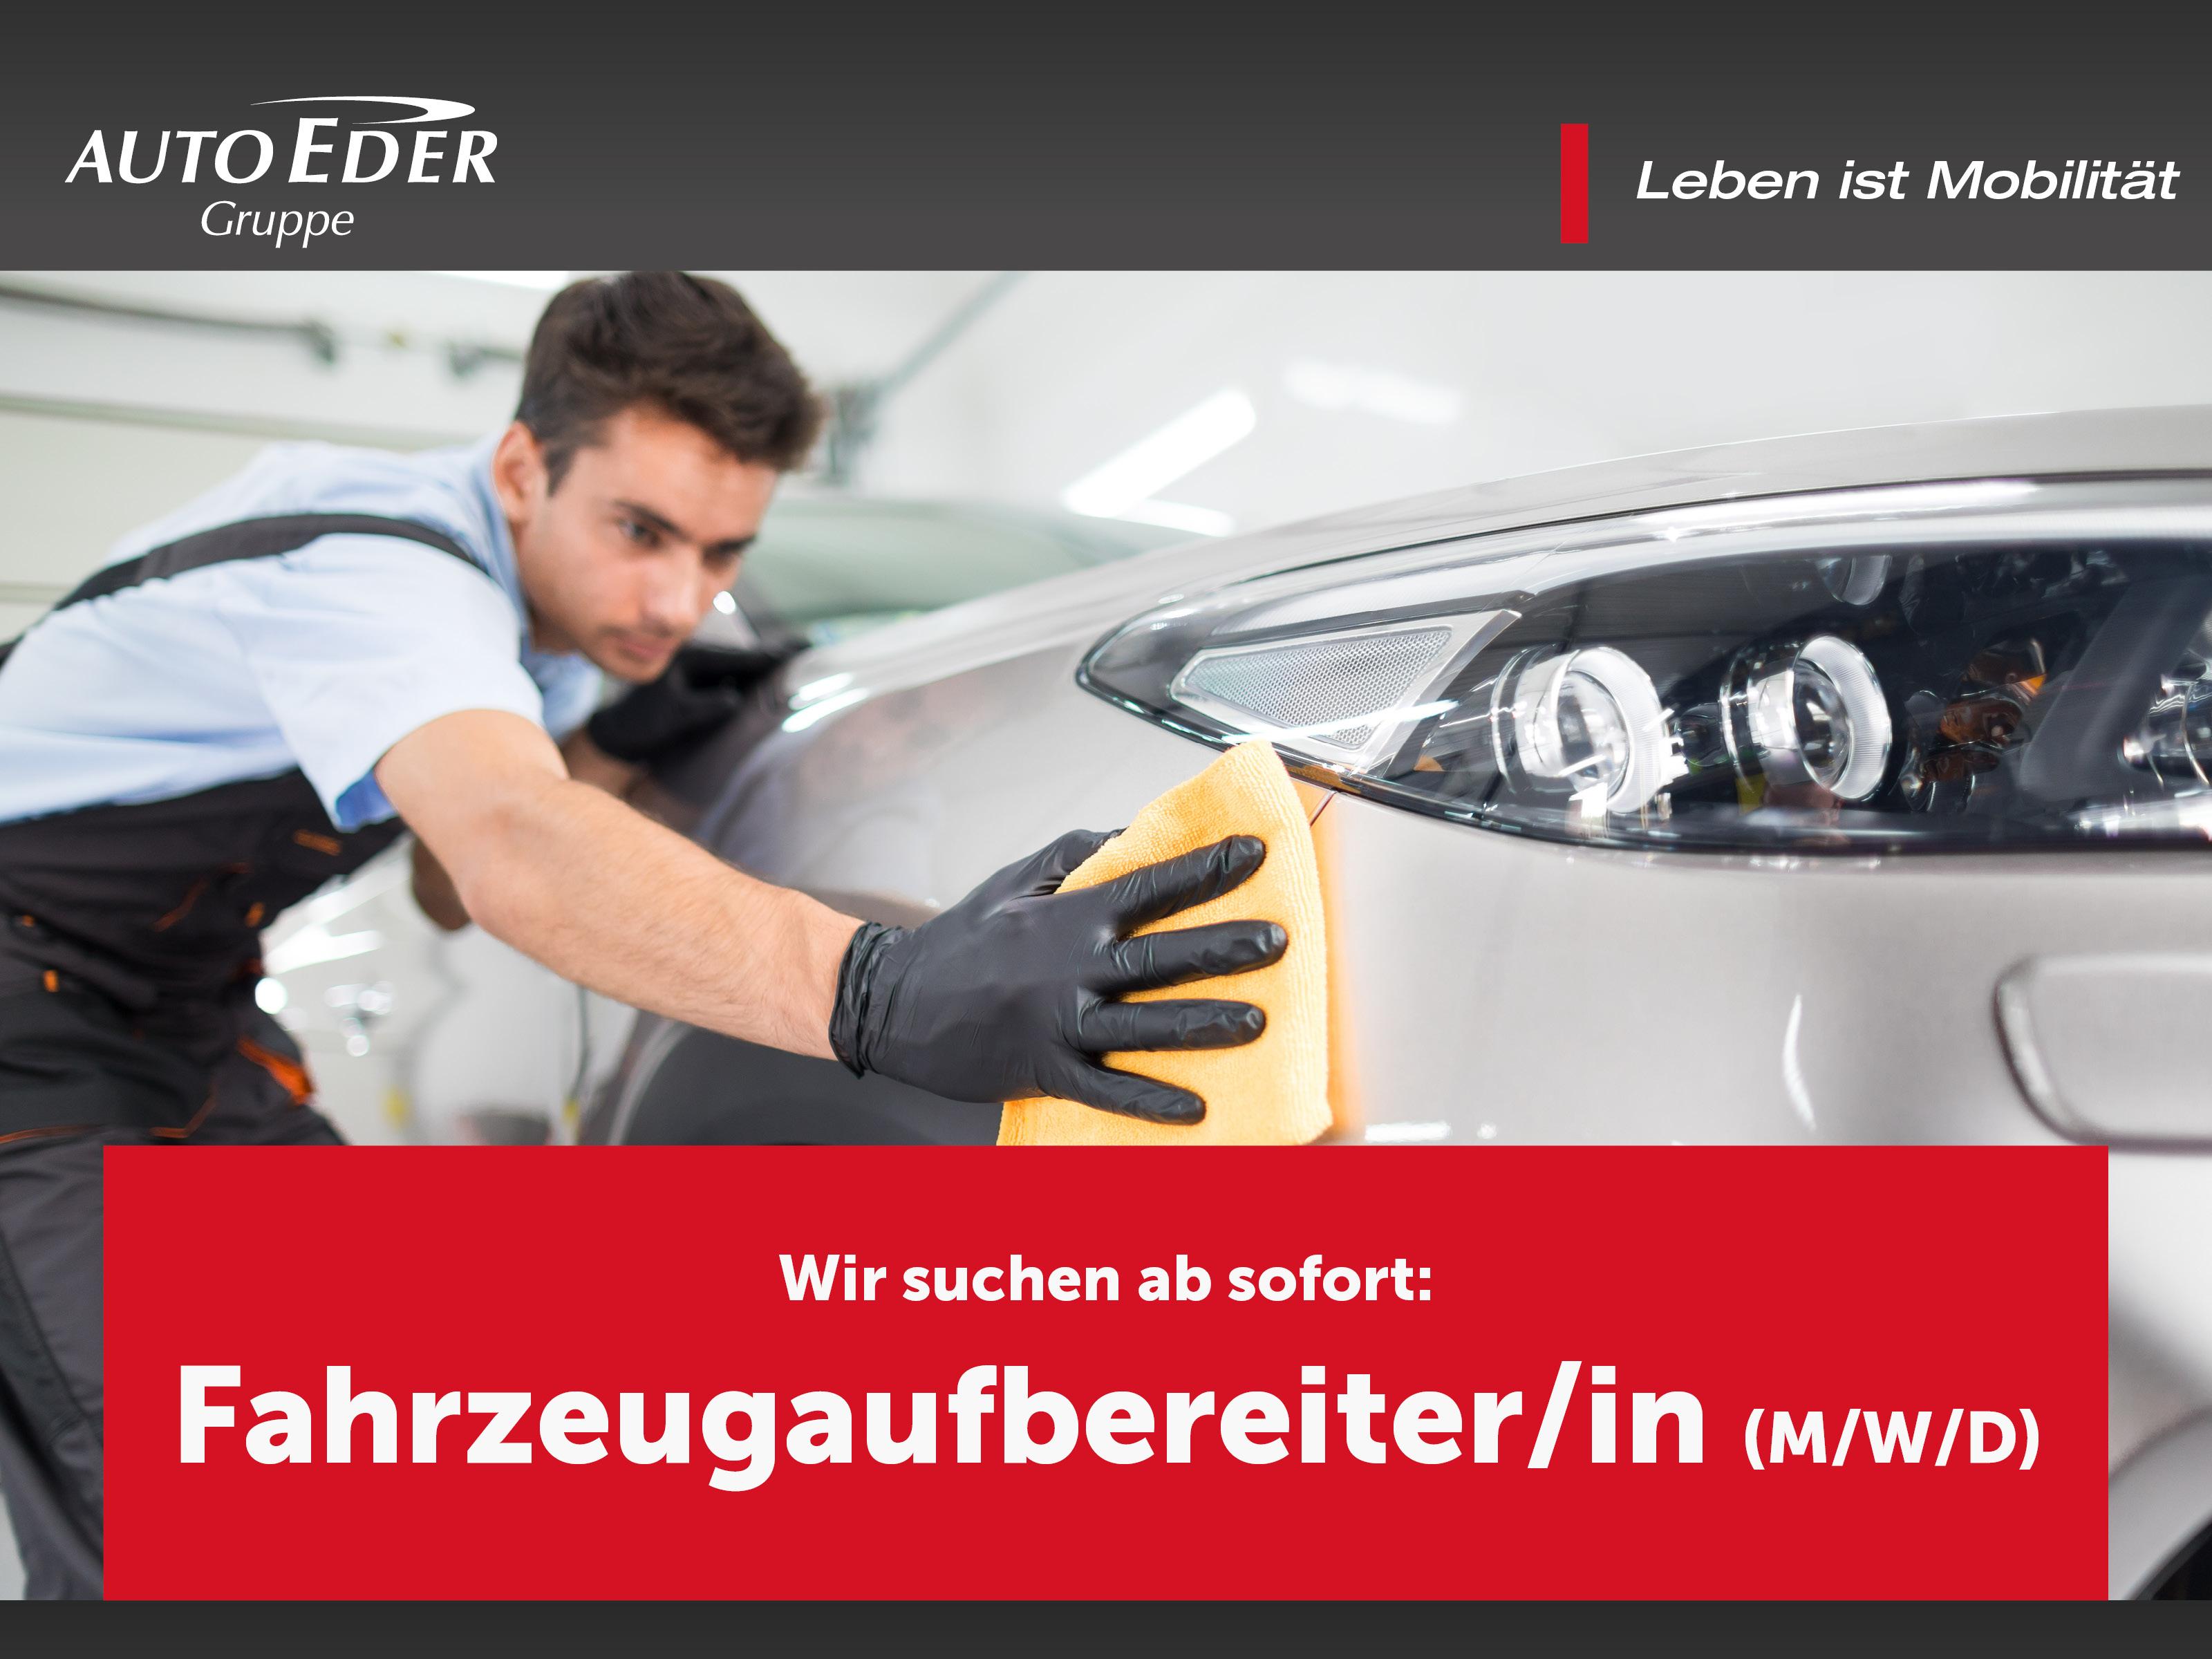 Fahrzeugaufbereiter (m/w/d)